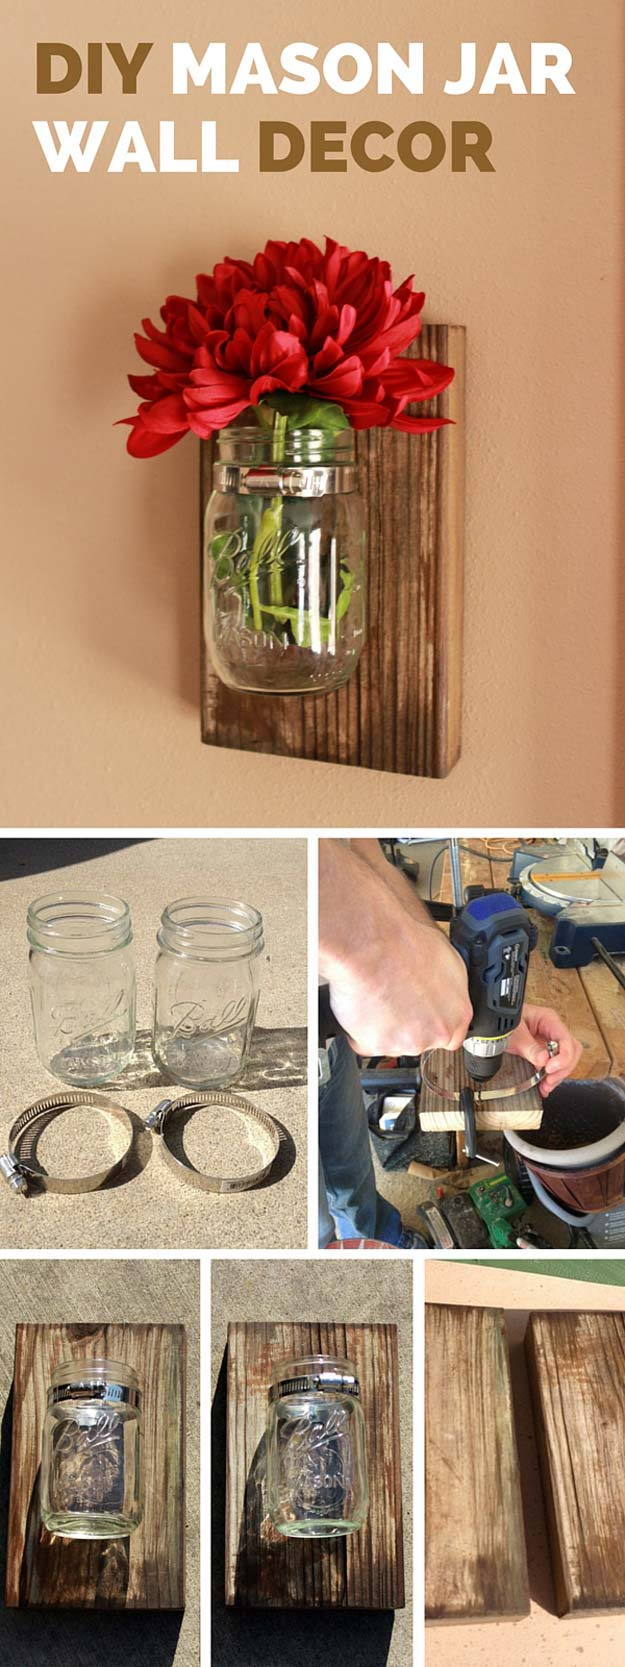 Diy Mason Jar Wall Decor Diy Projects For Teens